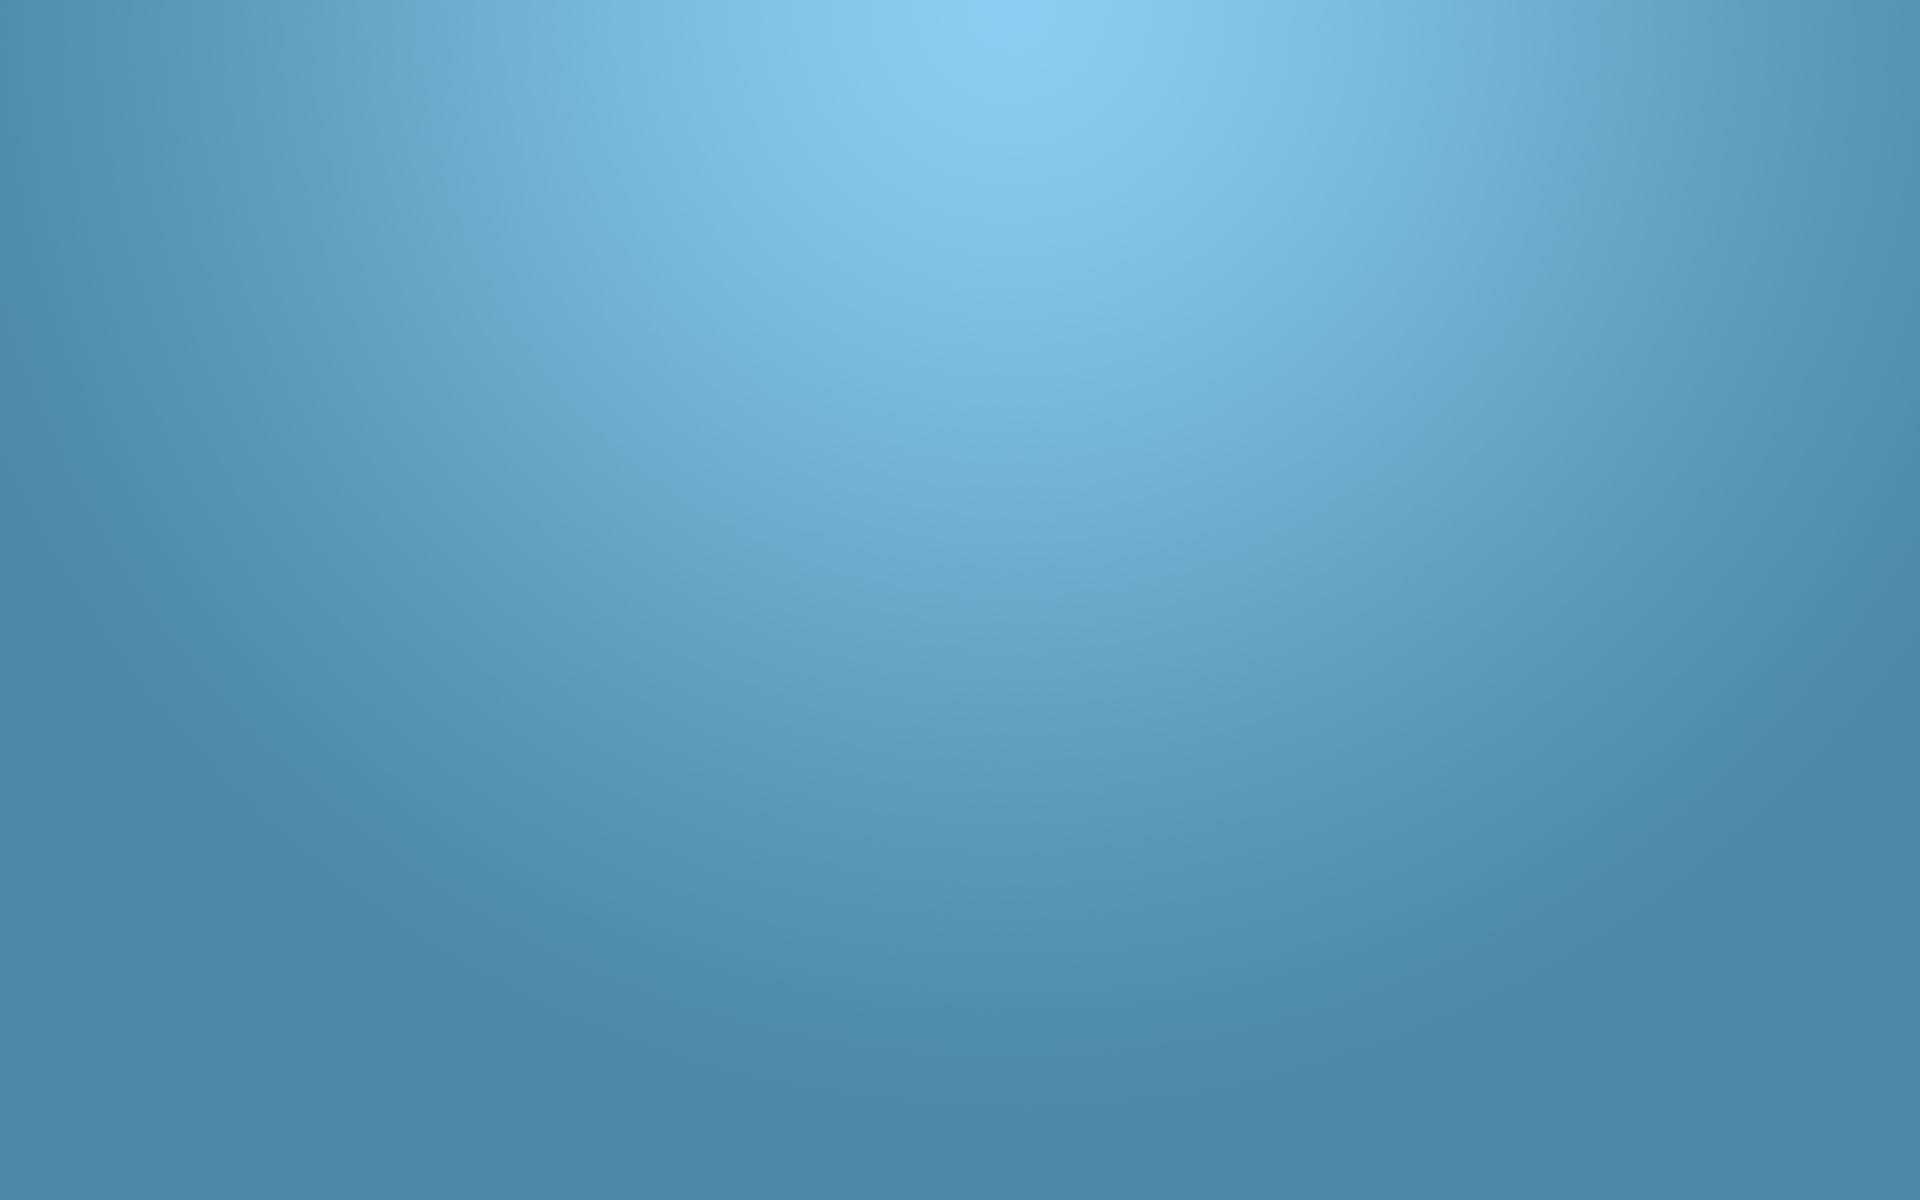 Baby Blue Windows 7 Desktop Wallpaper Baby Blue Wallpapers 1920x1200